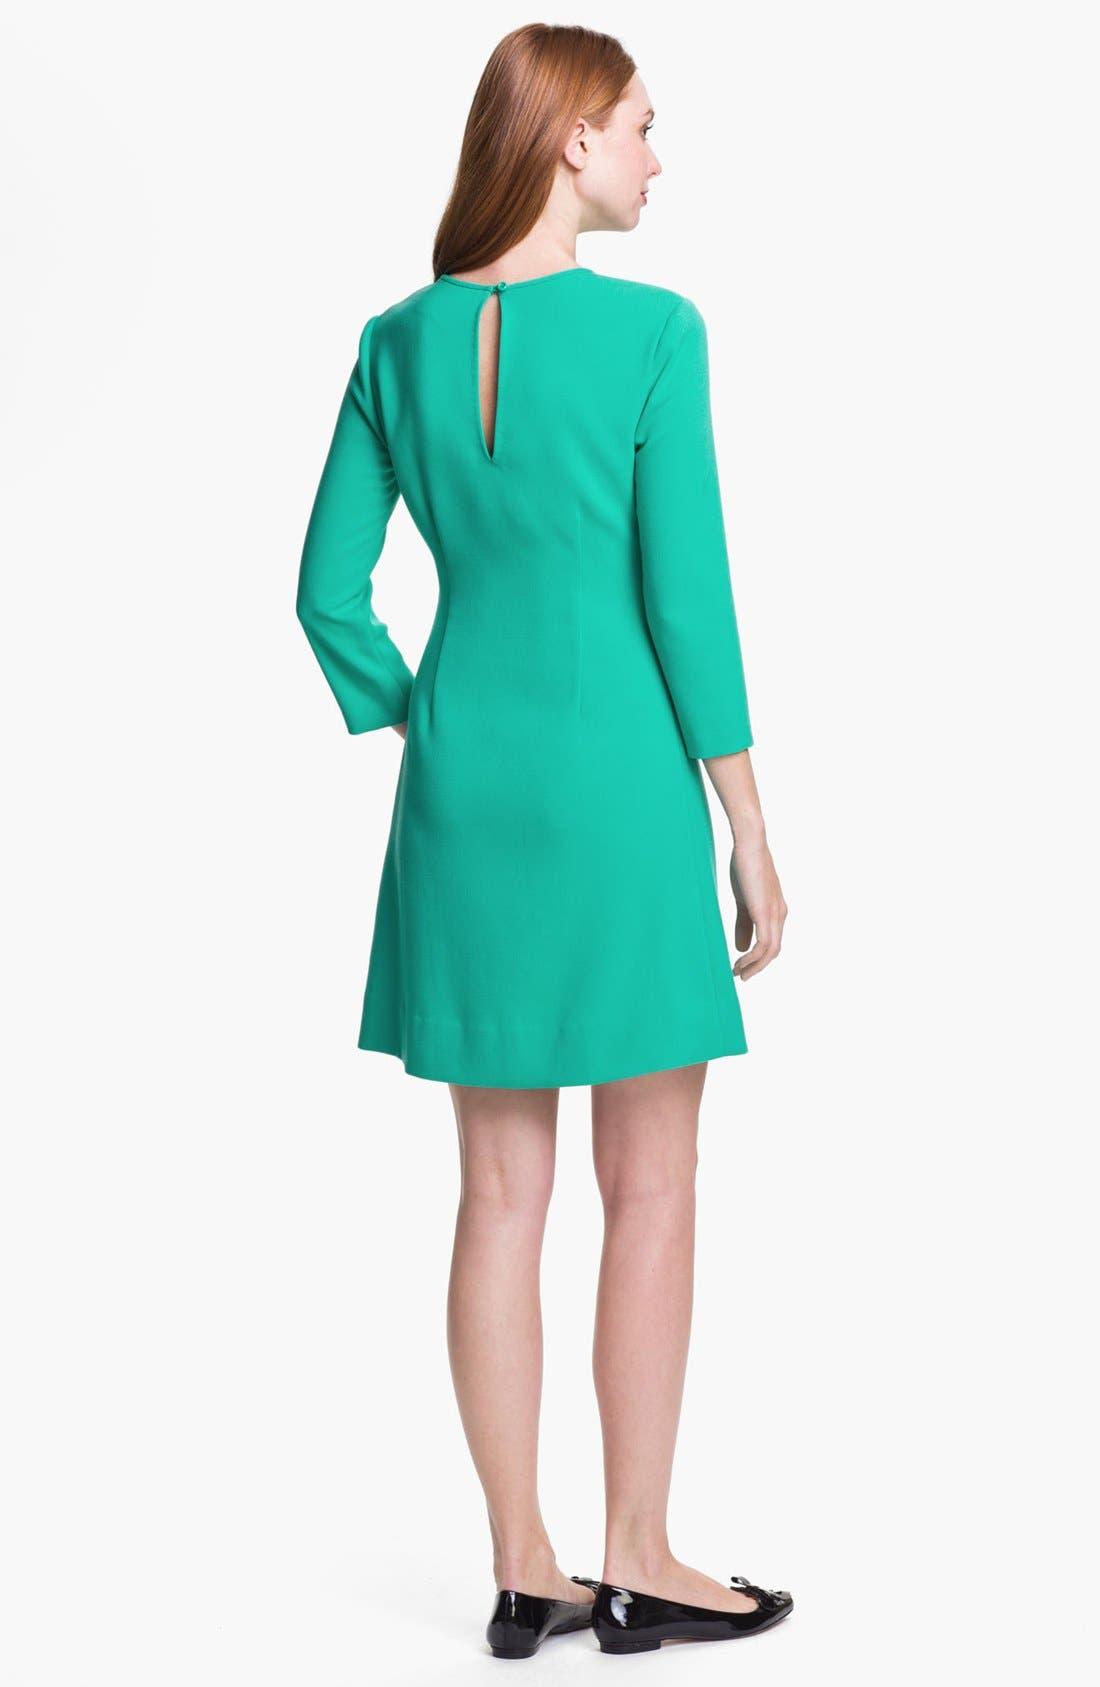 Alternate Image 2  - kate spade new york 'reilly' sheath dress (Nordstrom Exclusive)